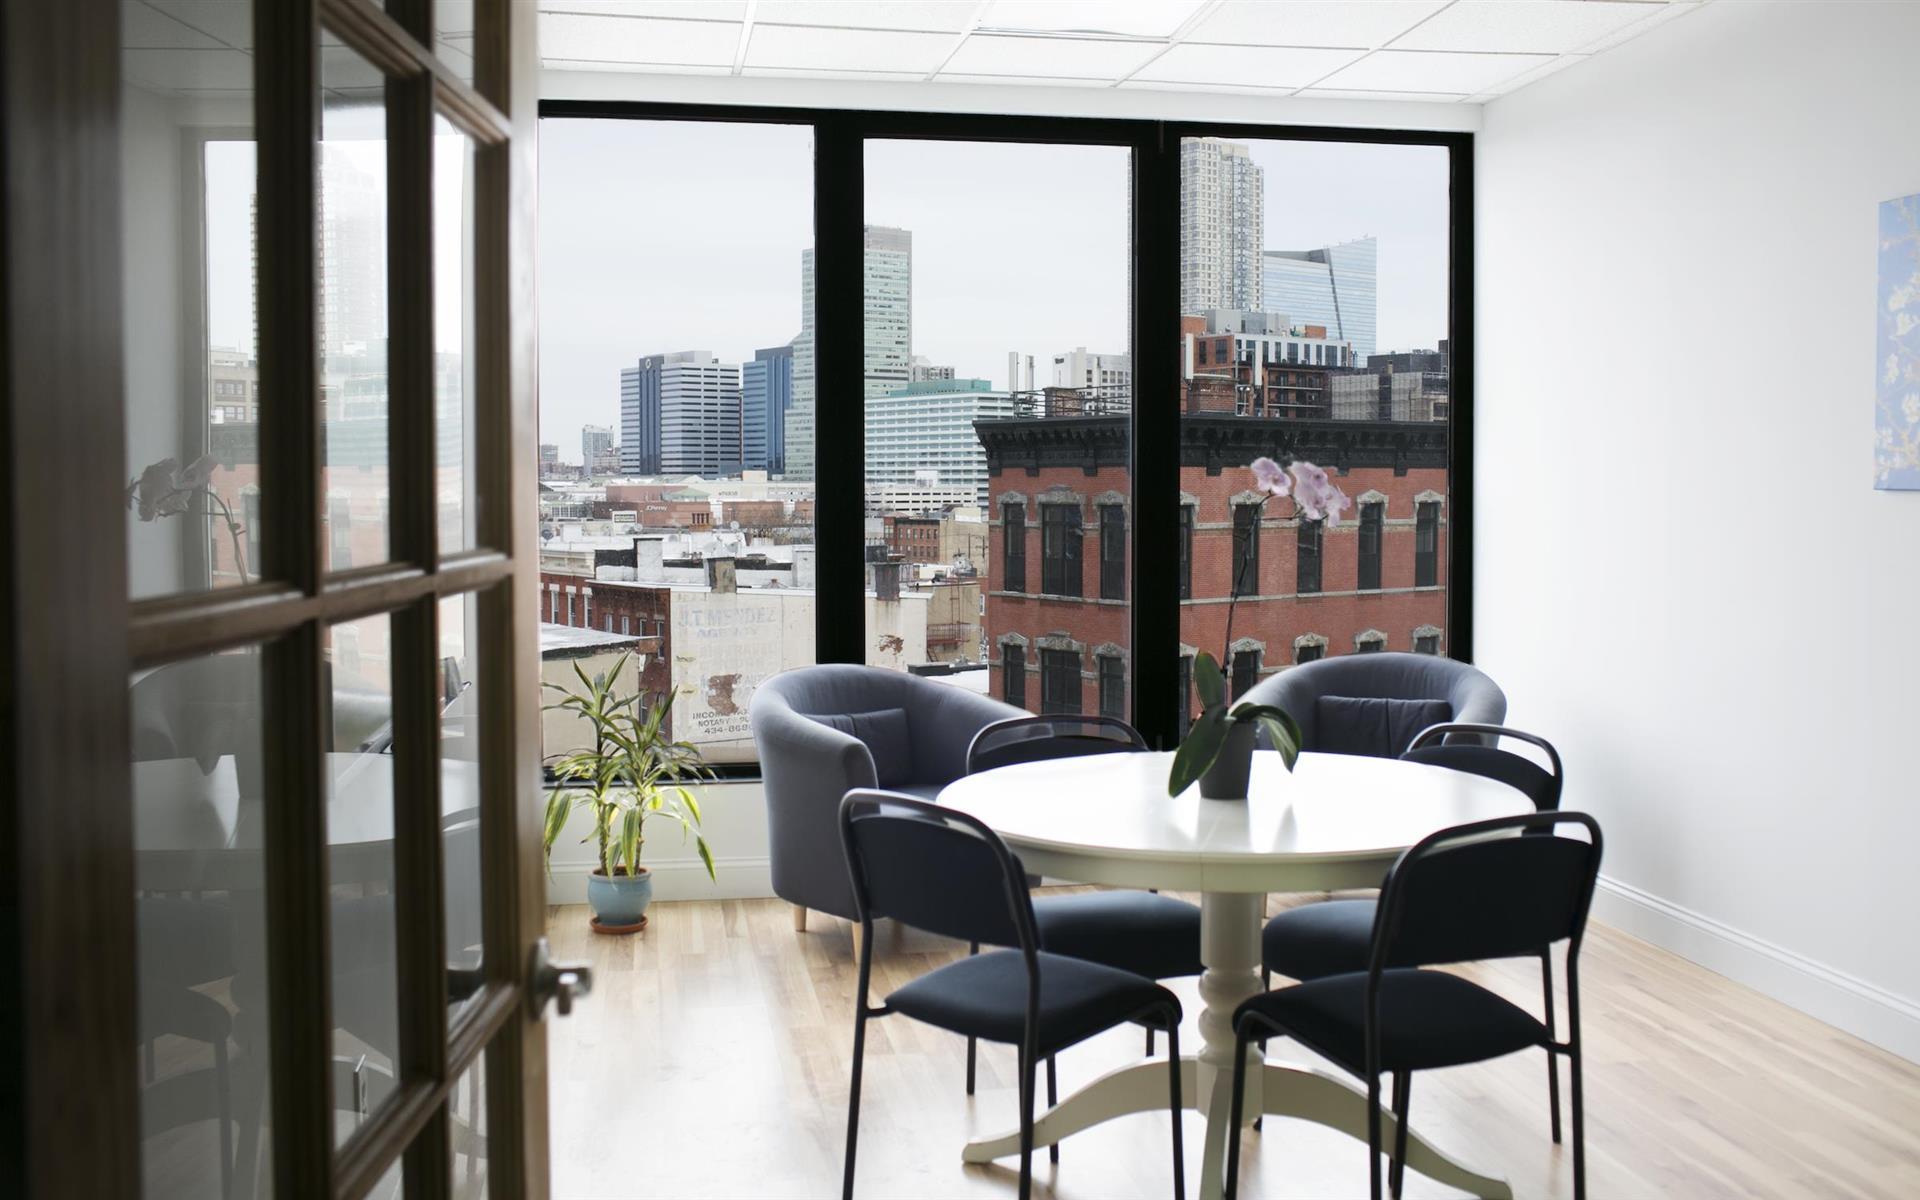 Indiegrove - Meeting Room (5th Floor)